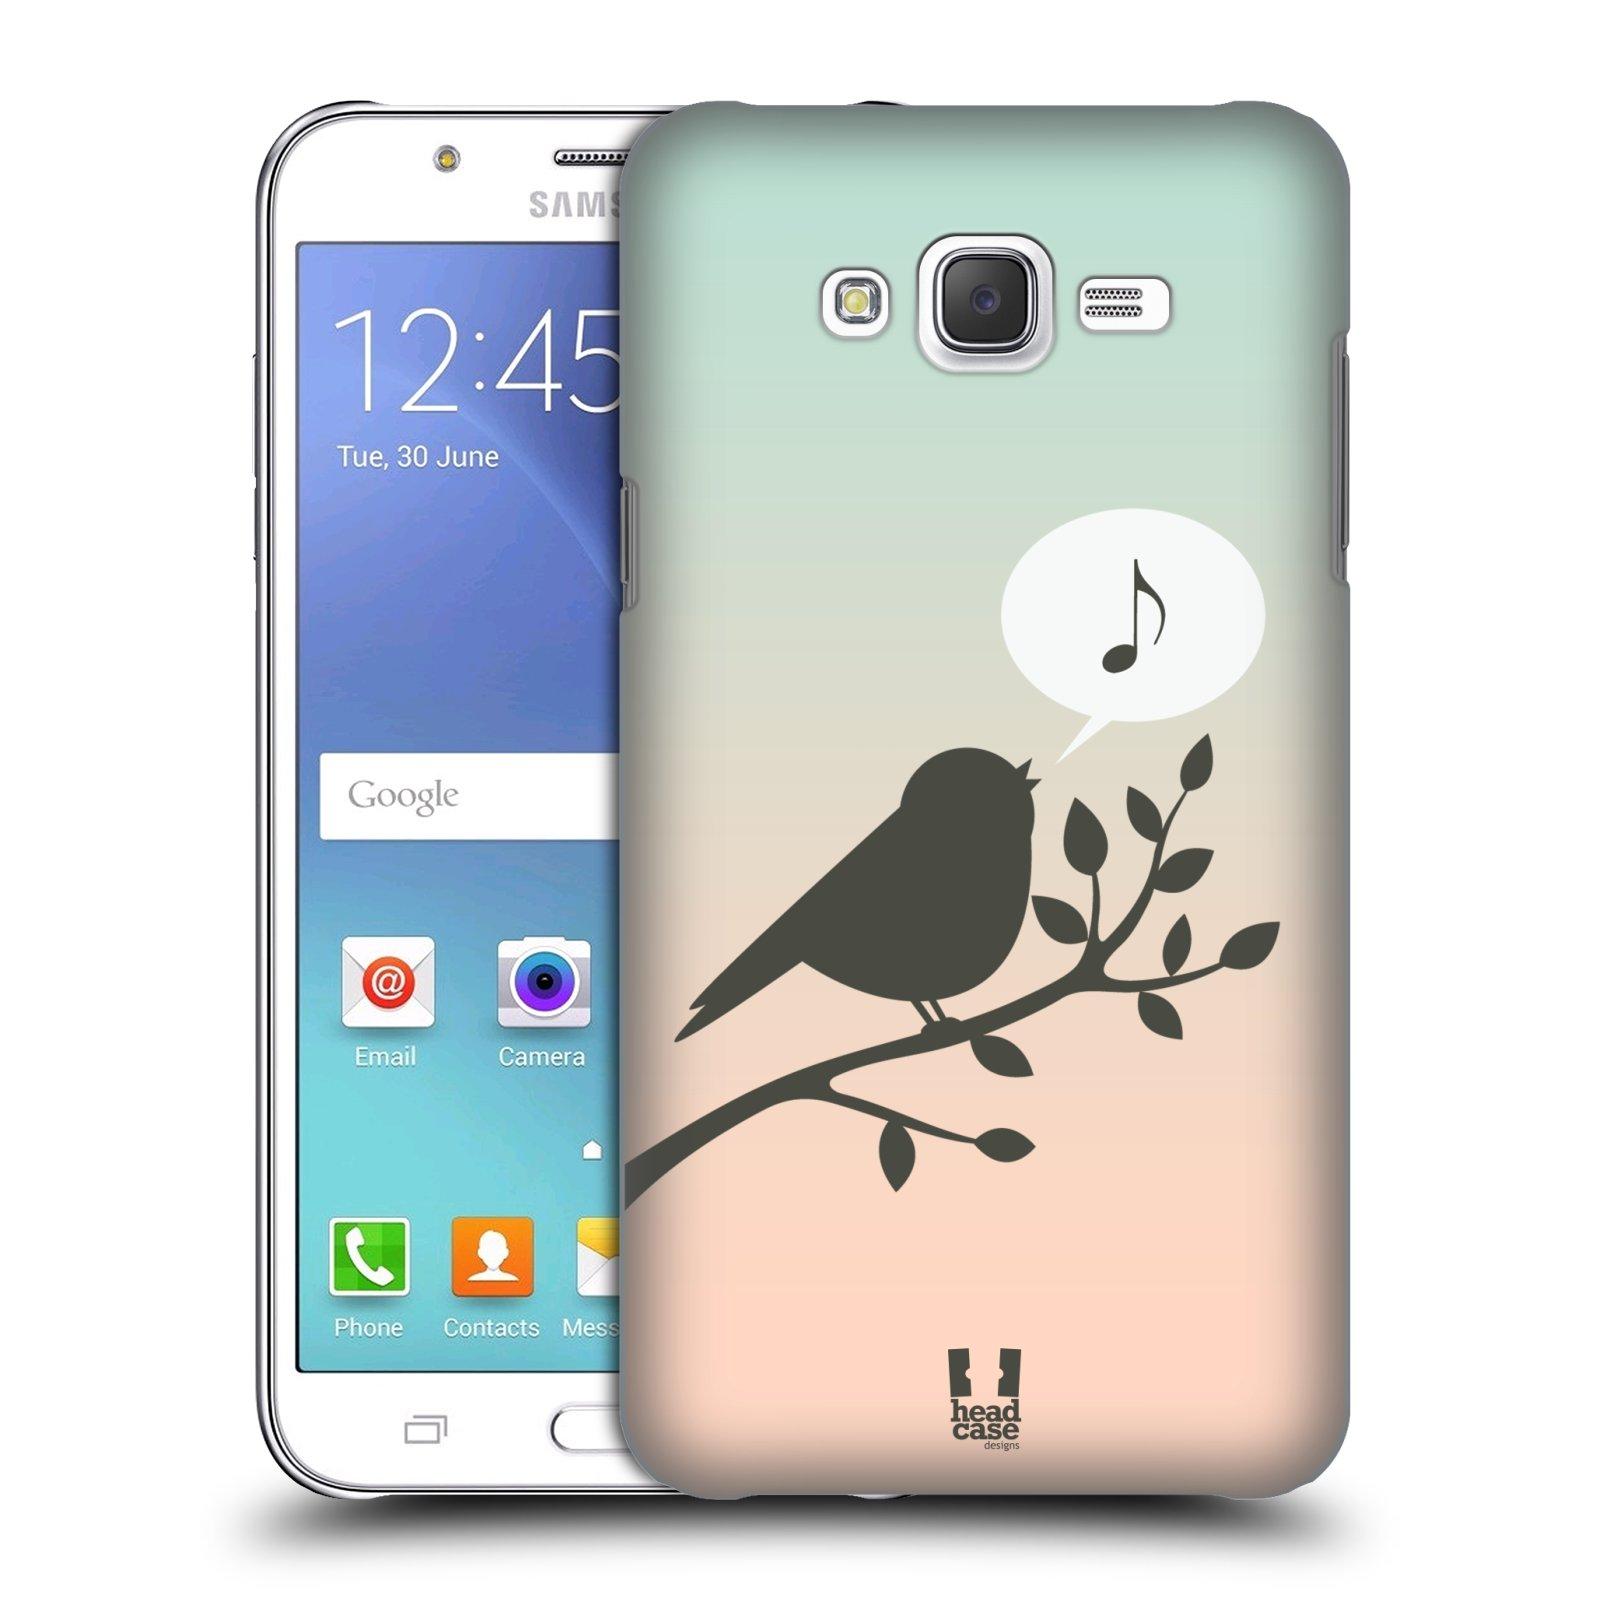 HEAD CASE plastový obal na mobil SAMSUNG Galaxy J7, J700 vzor Ptáček zpěváček noty píseň